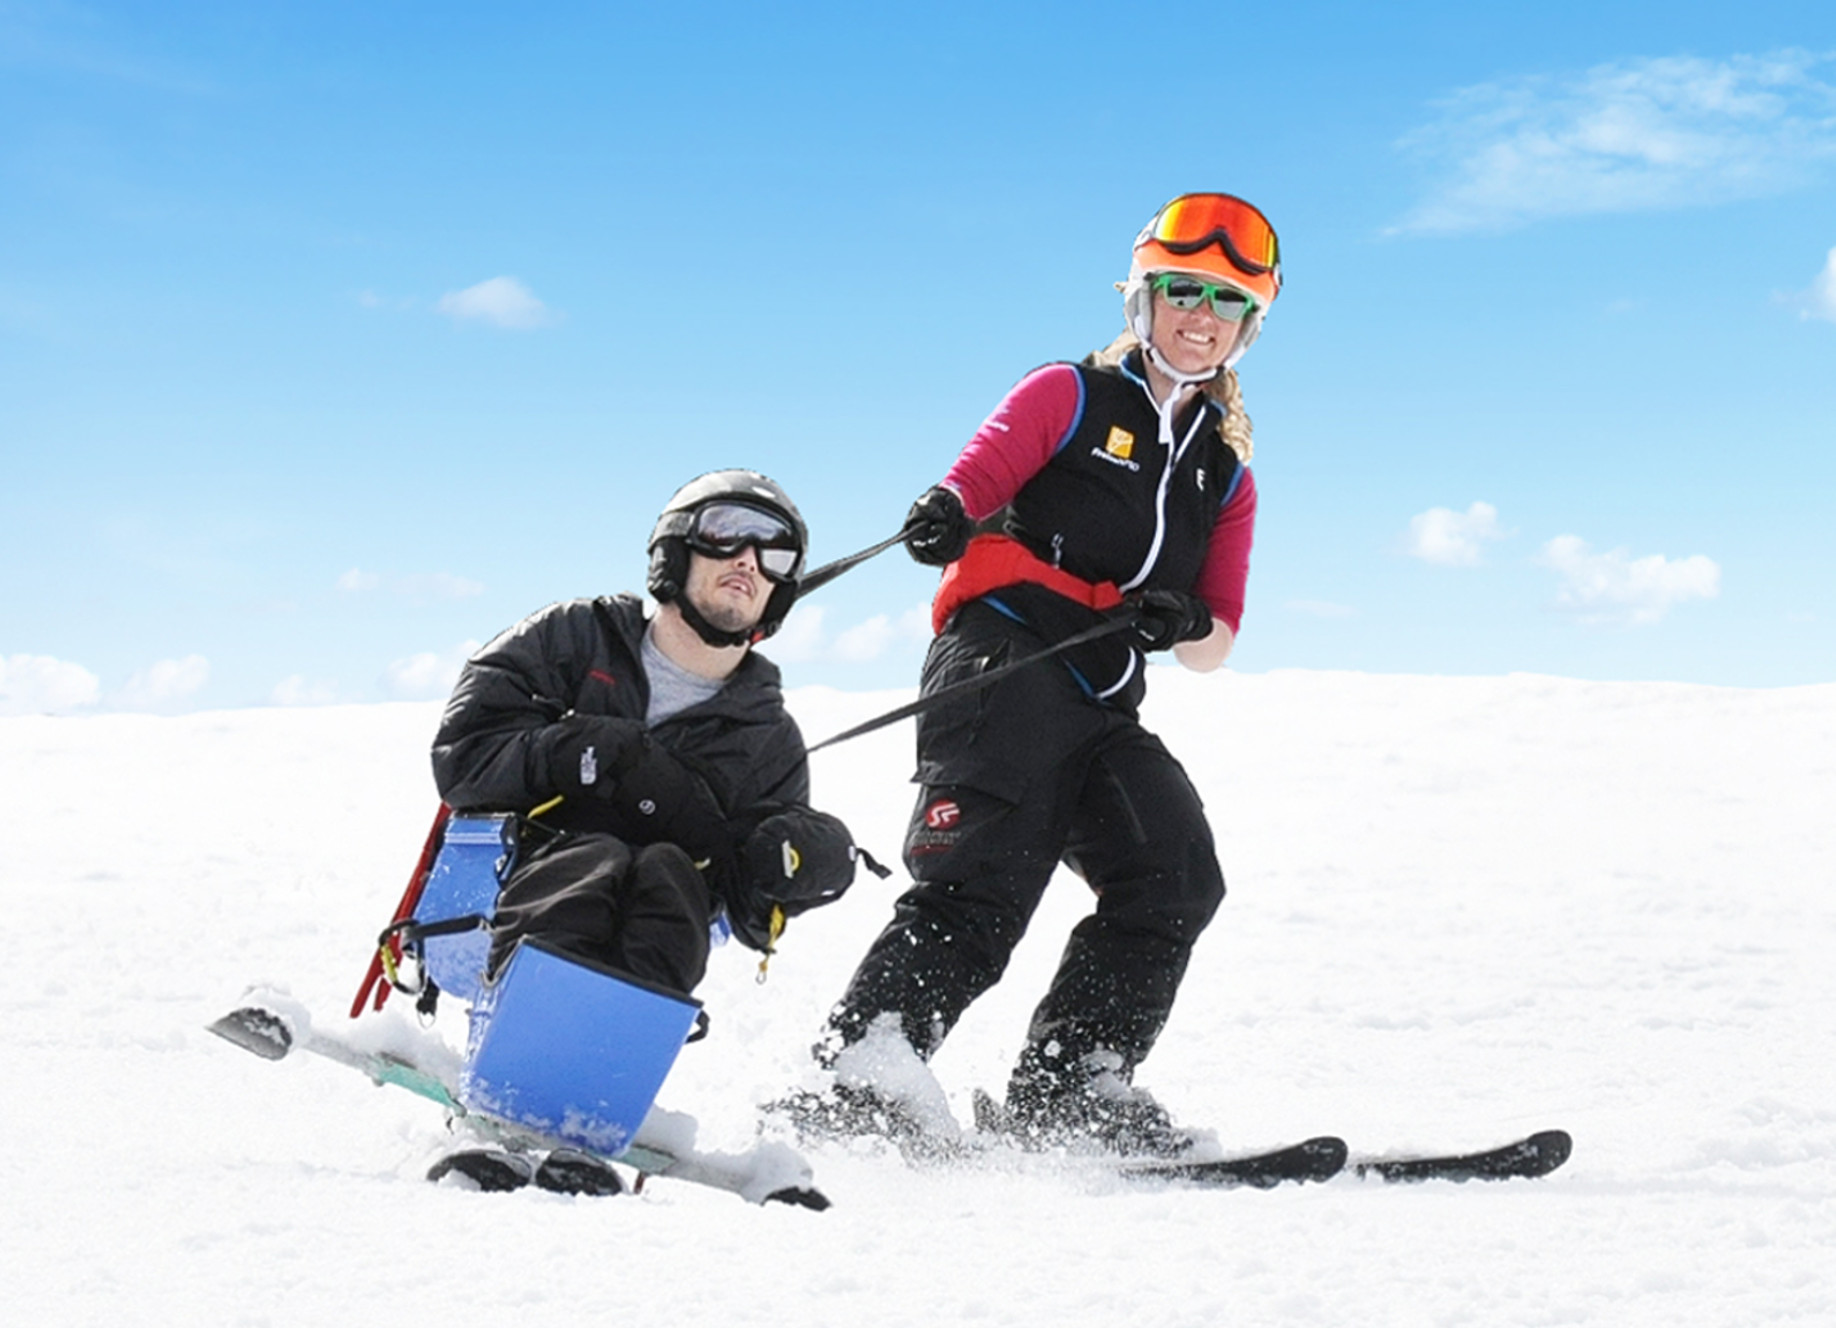 Sitskimodell Mountain Man für Rollstuhlfahrer